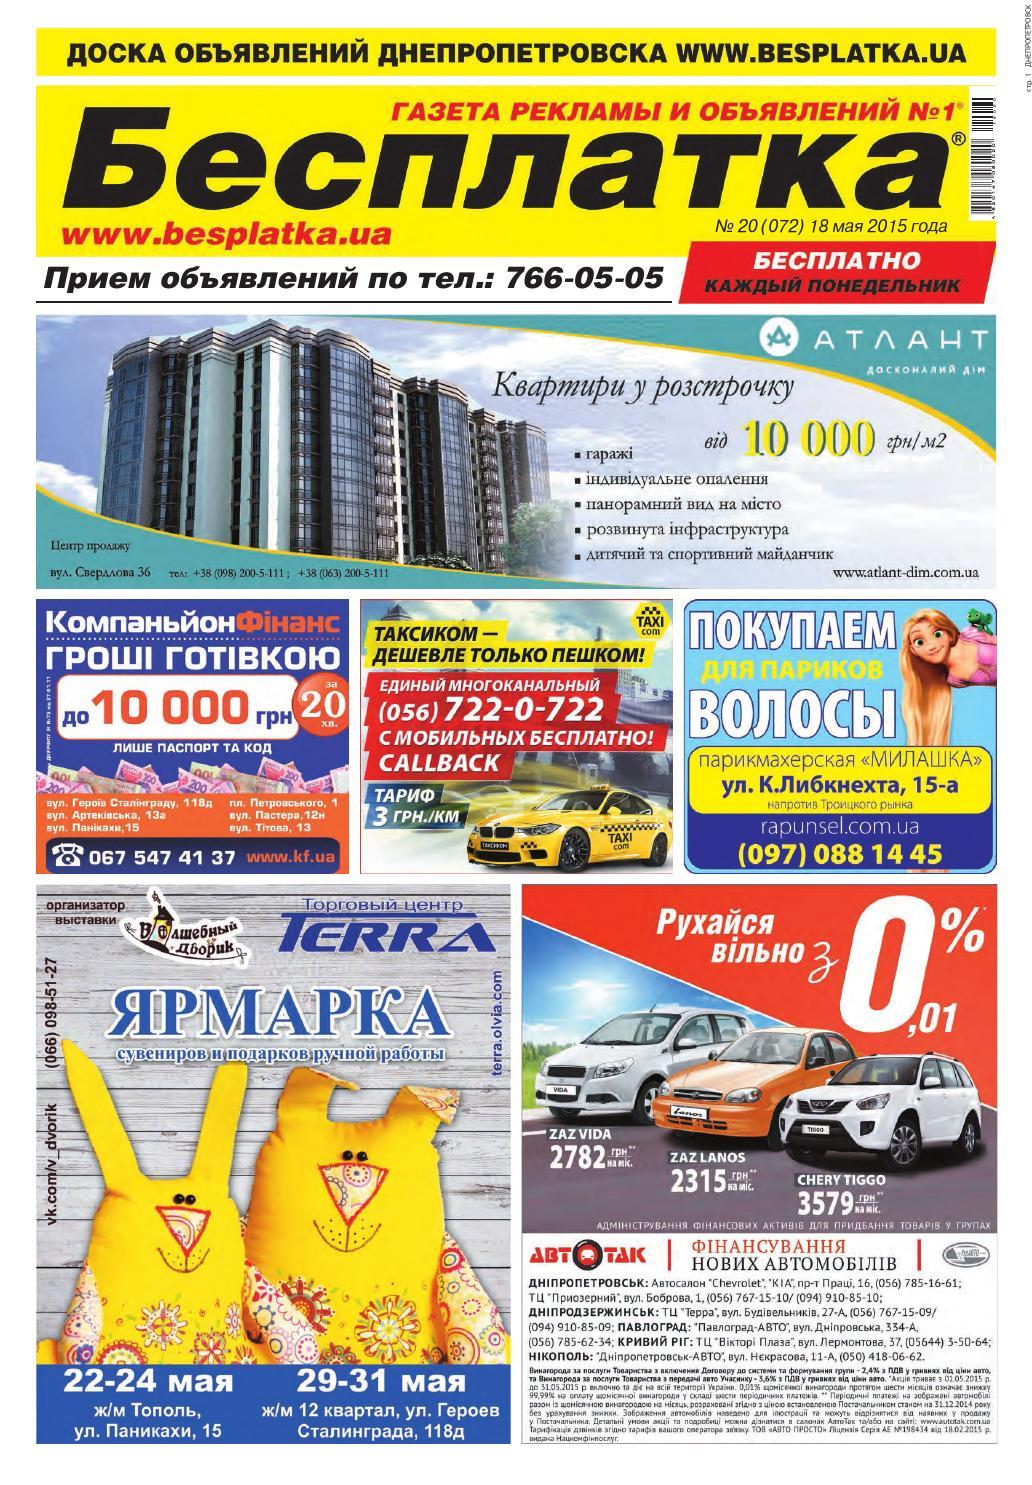 06aa8aefe7663 Besplatka_18.05.2015_Dnepr by besplatka ukraine - issuu